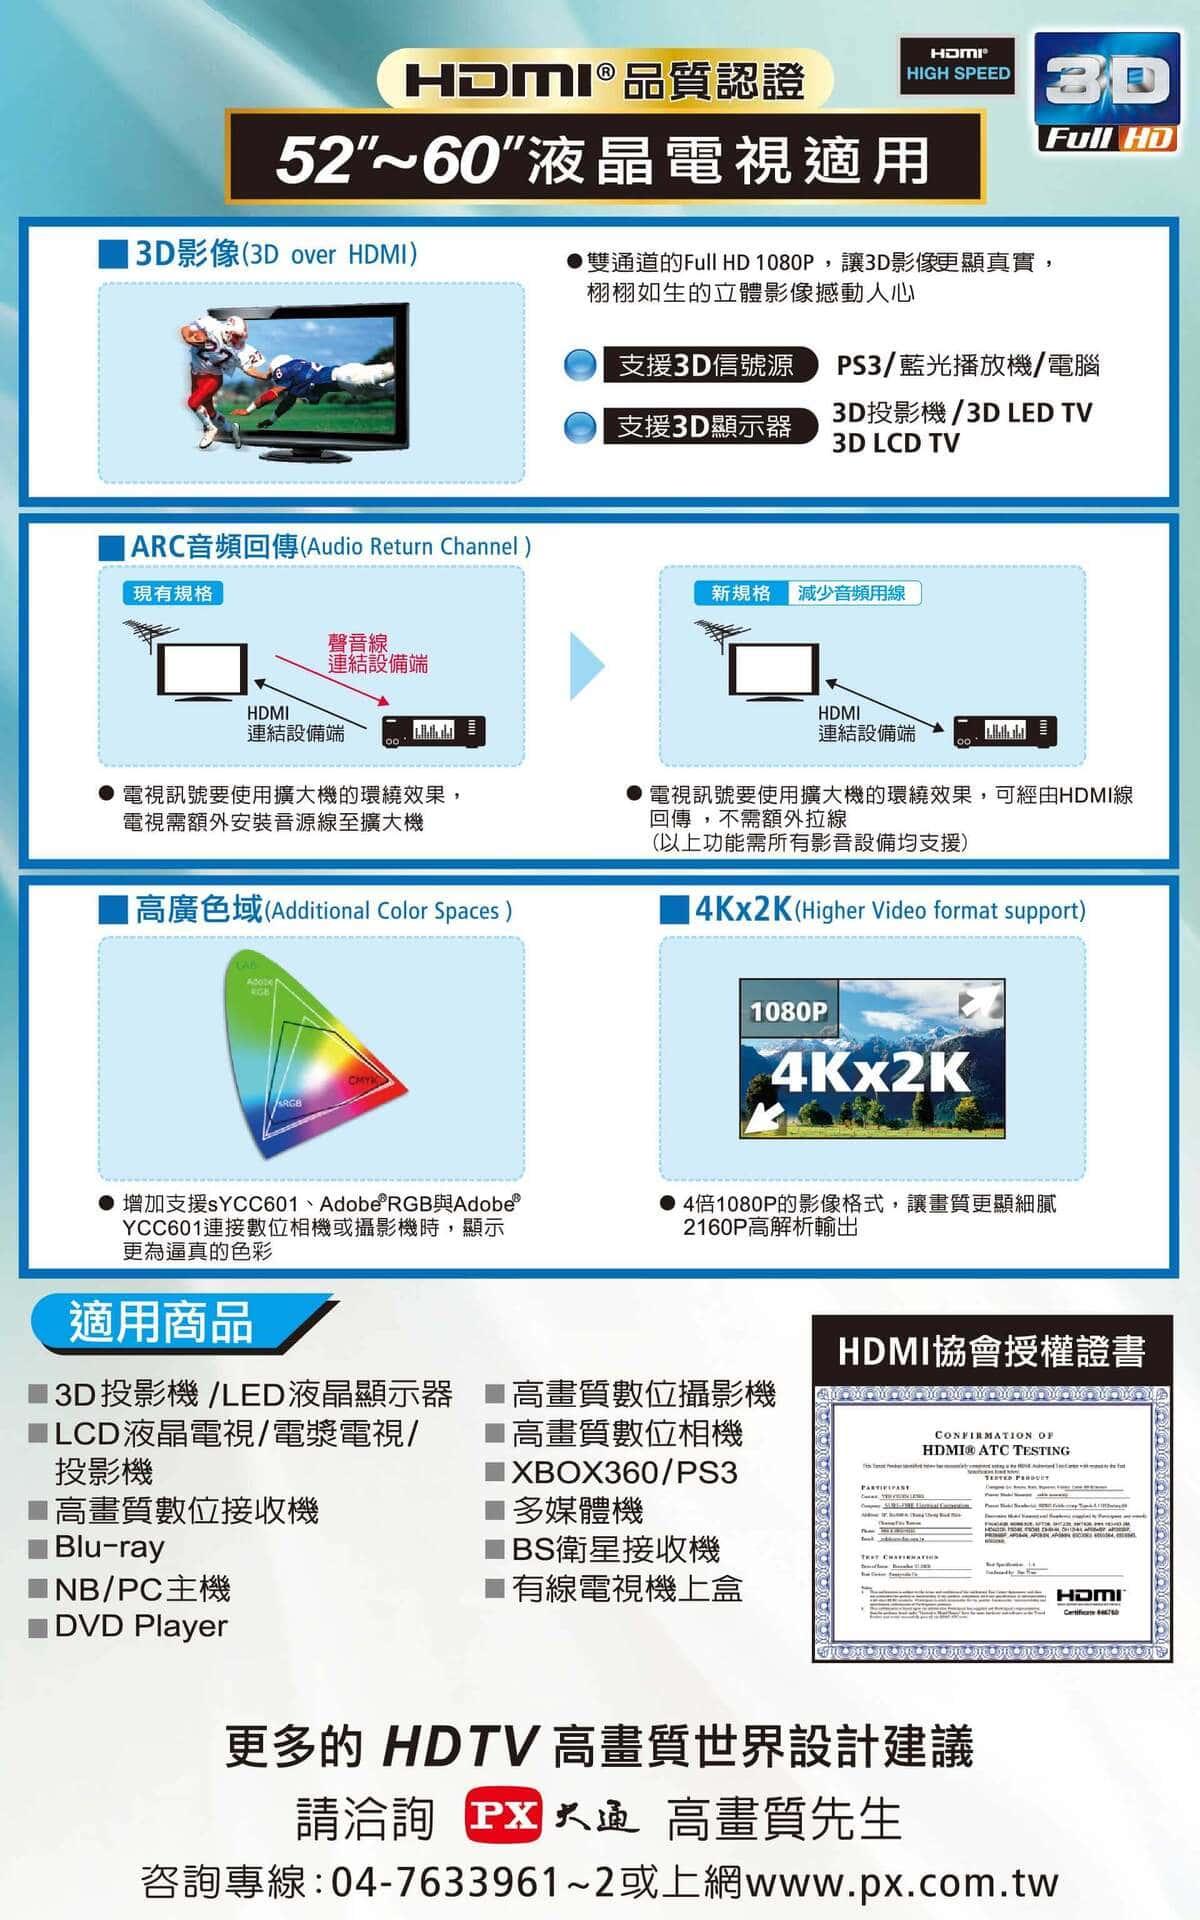 proimages/product/pro-02/pro02-001/HDMI-5MM/HDMI-5MM-4.jpg